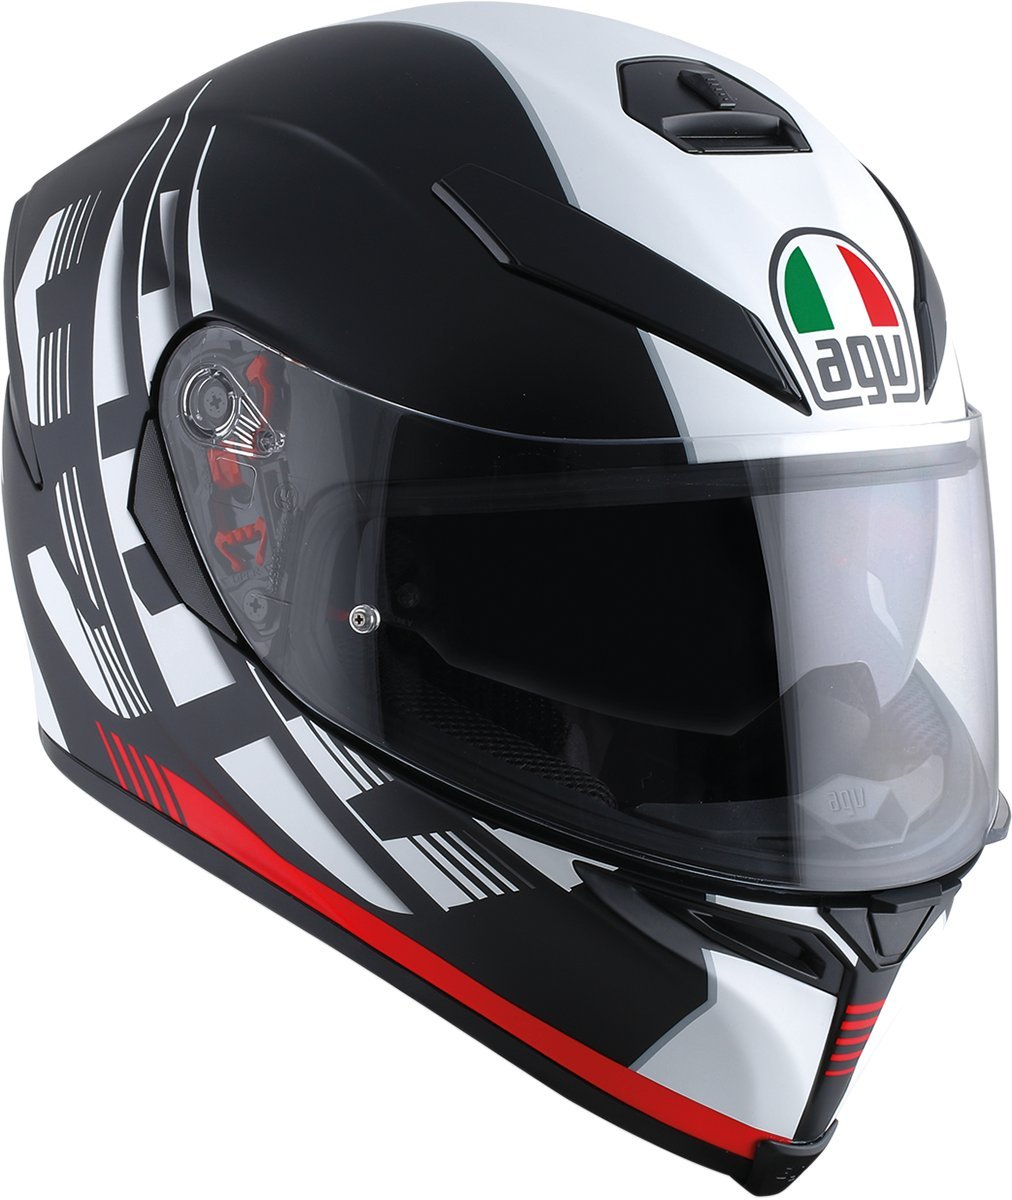 AGV K-5 Unisex-Adult Full-Face-Helmet-Style Storm Helmet Black//Red, Medium-Small